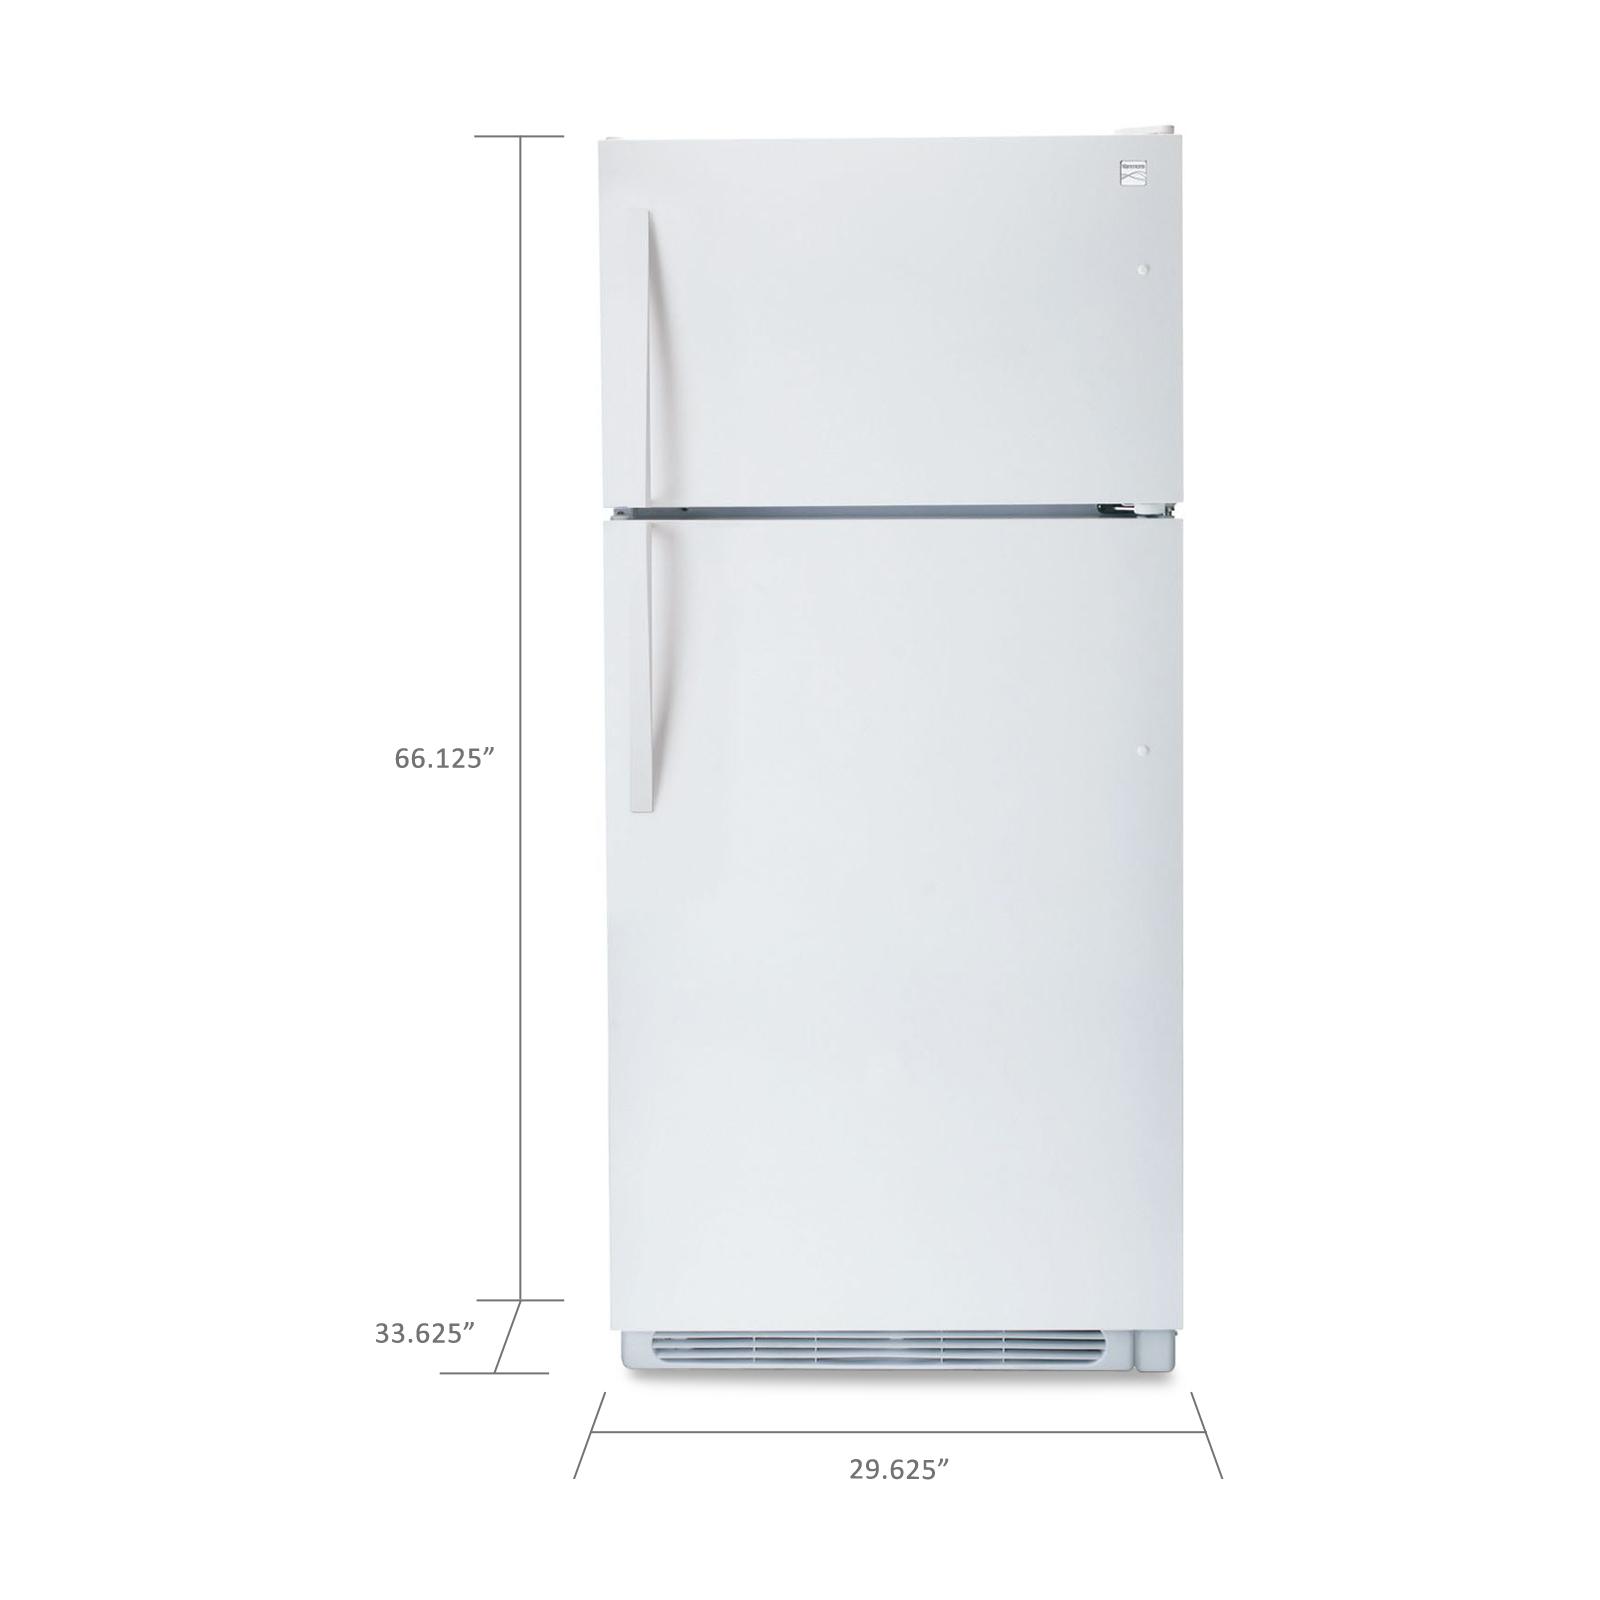 Kenmore 18.2 cu. ft. Top-Freezer Refrigerator w/ Wire Shelves - White